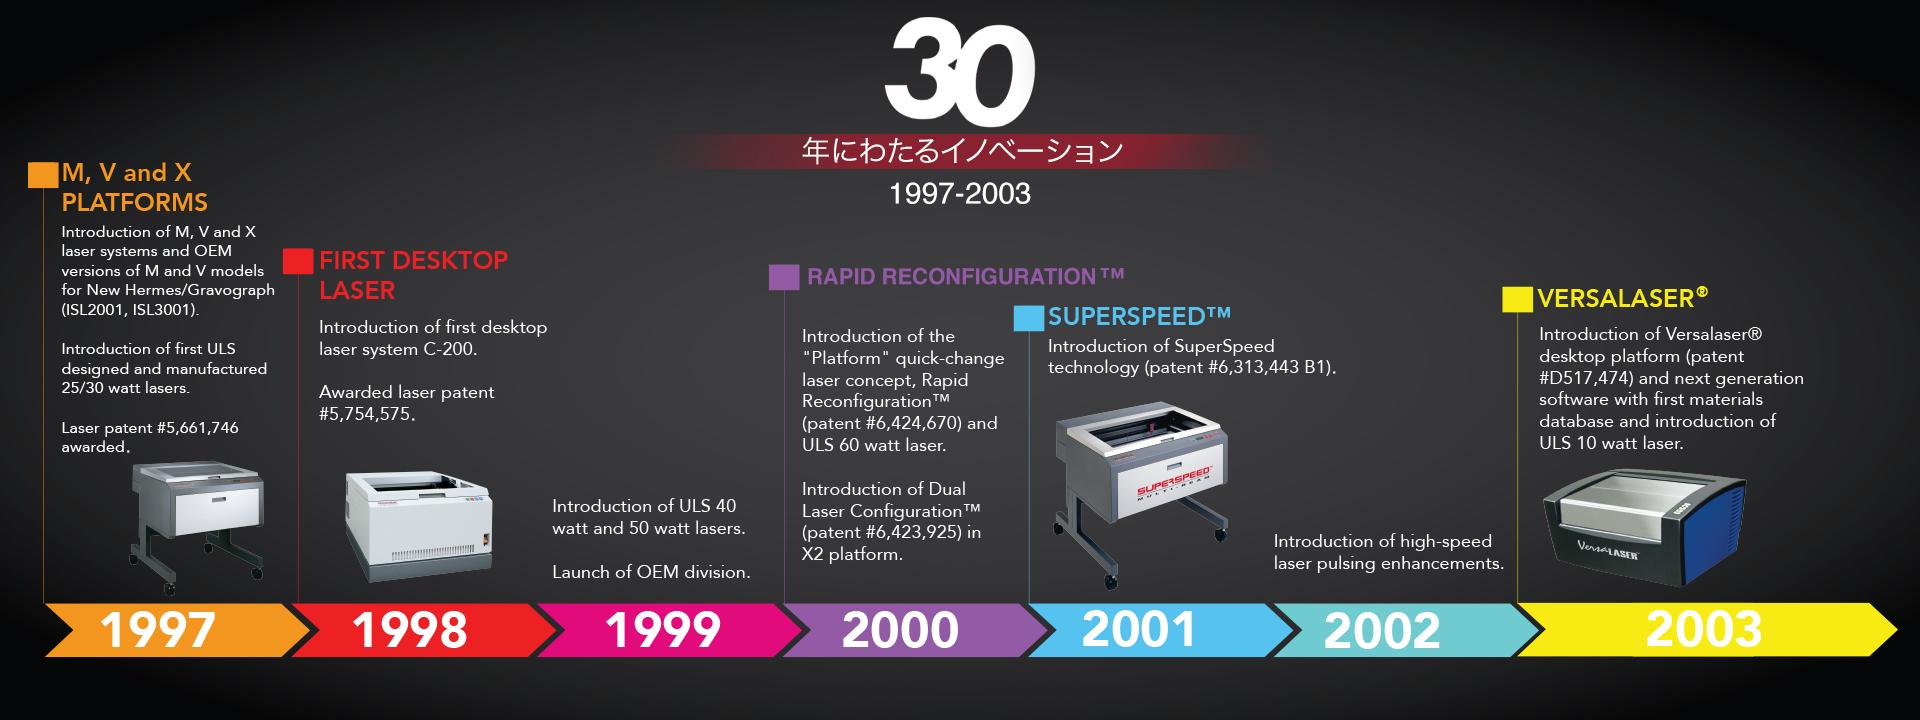 ULS Japanese Timeline 2